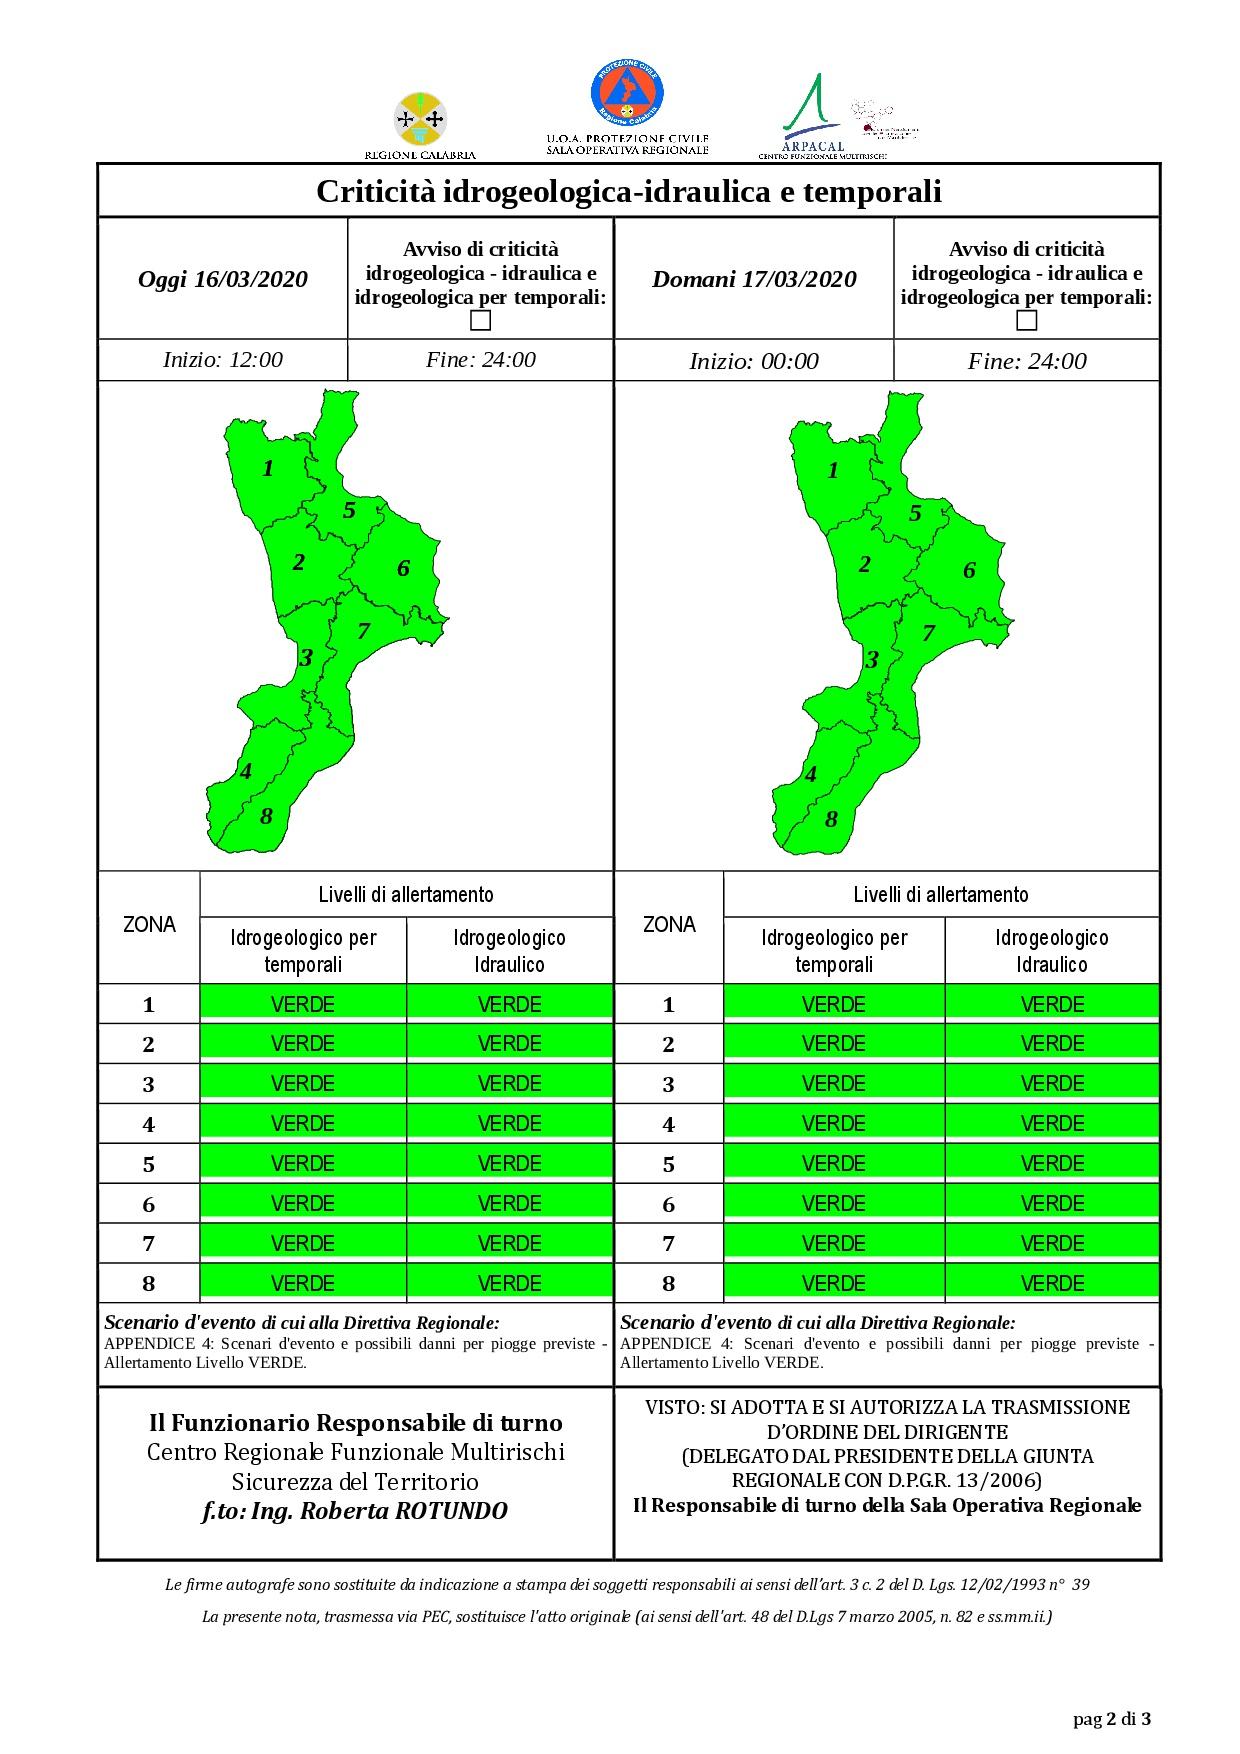 Criticità idrogeologica-idraulica e temporali in Calabria 16-03-2020